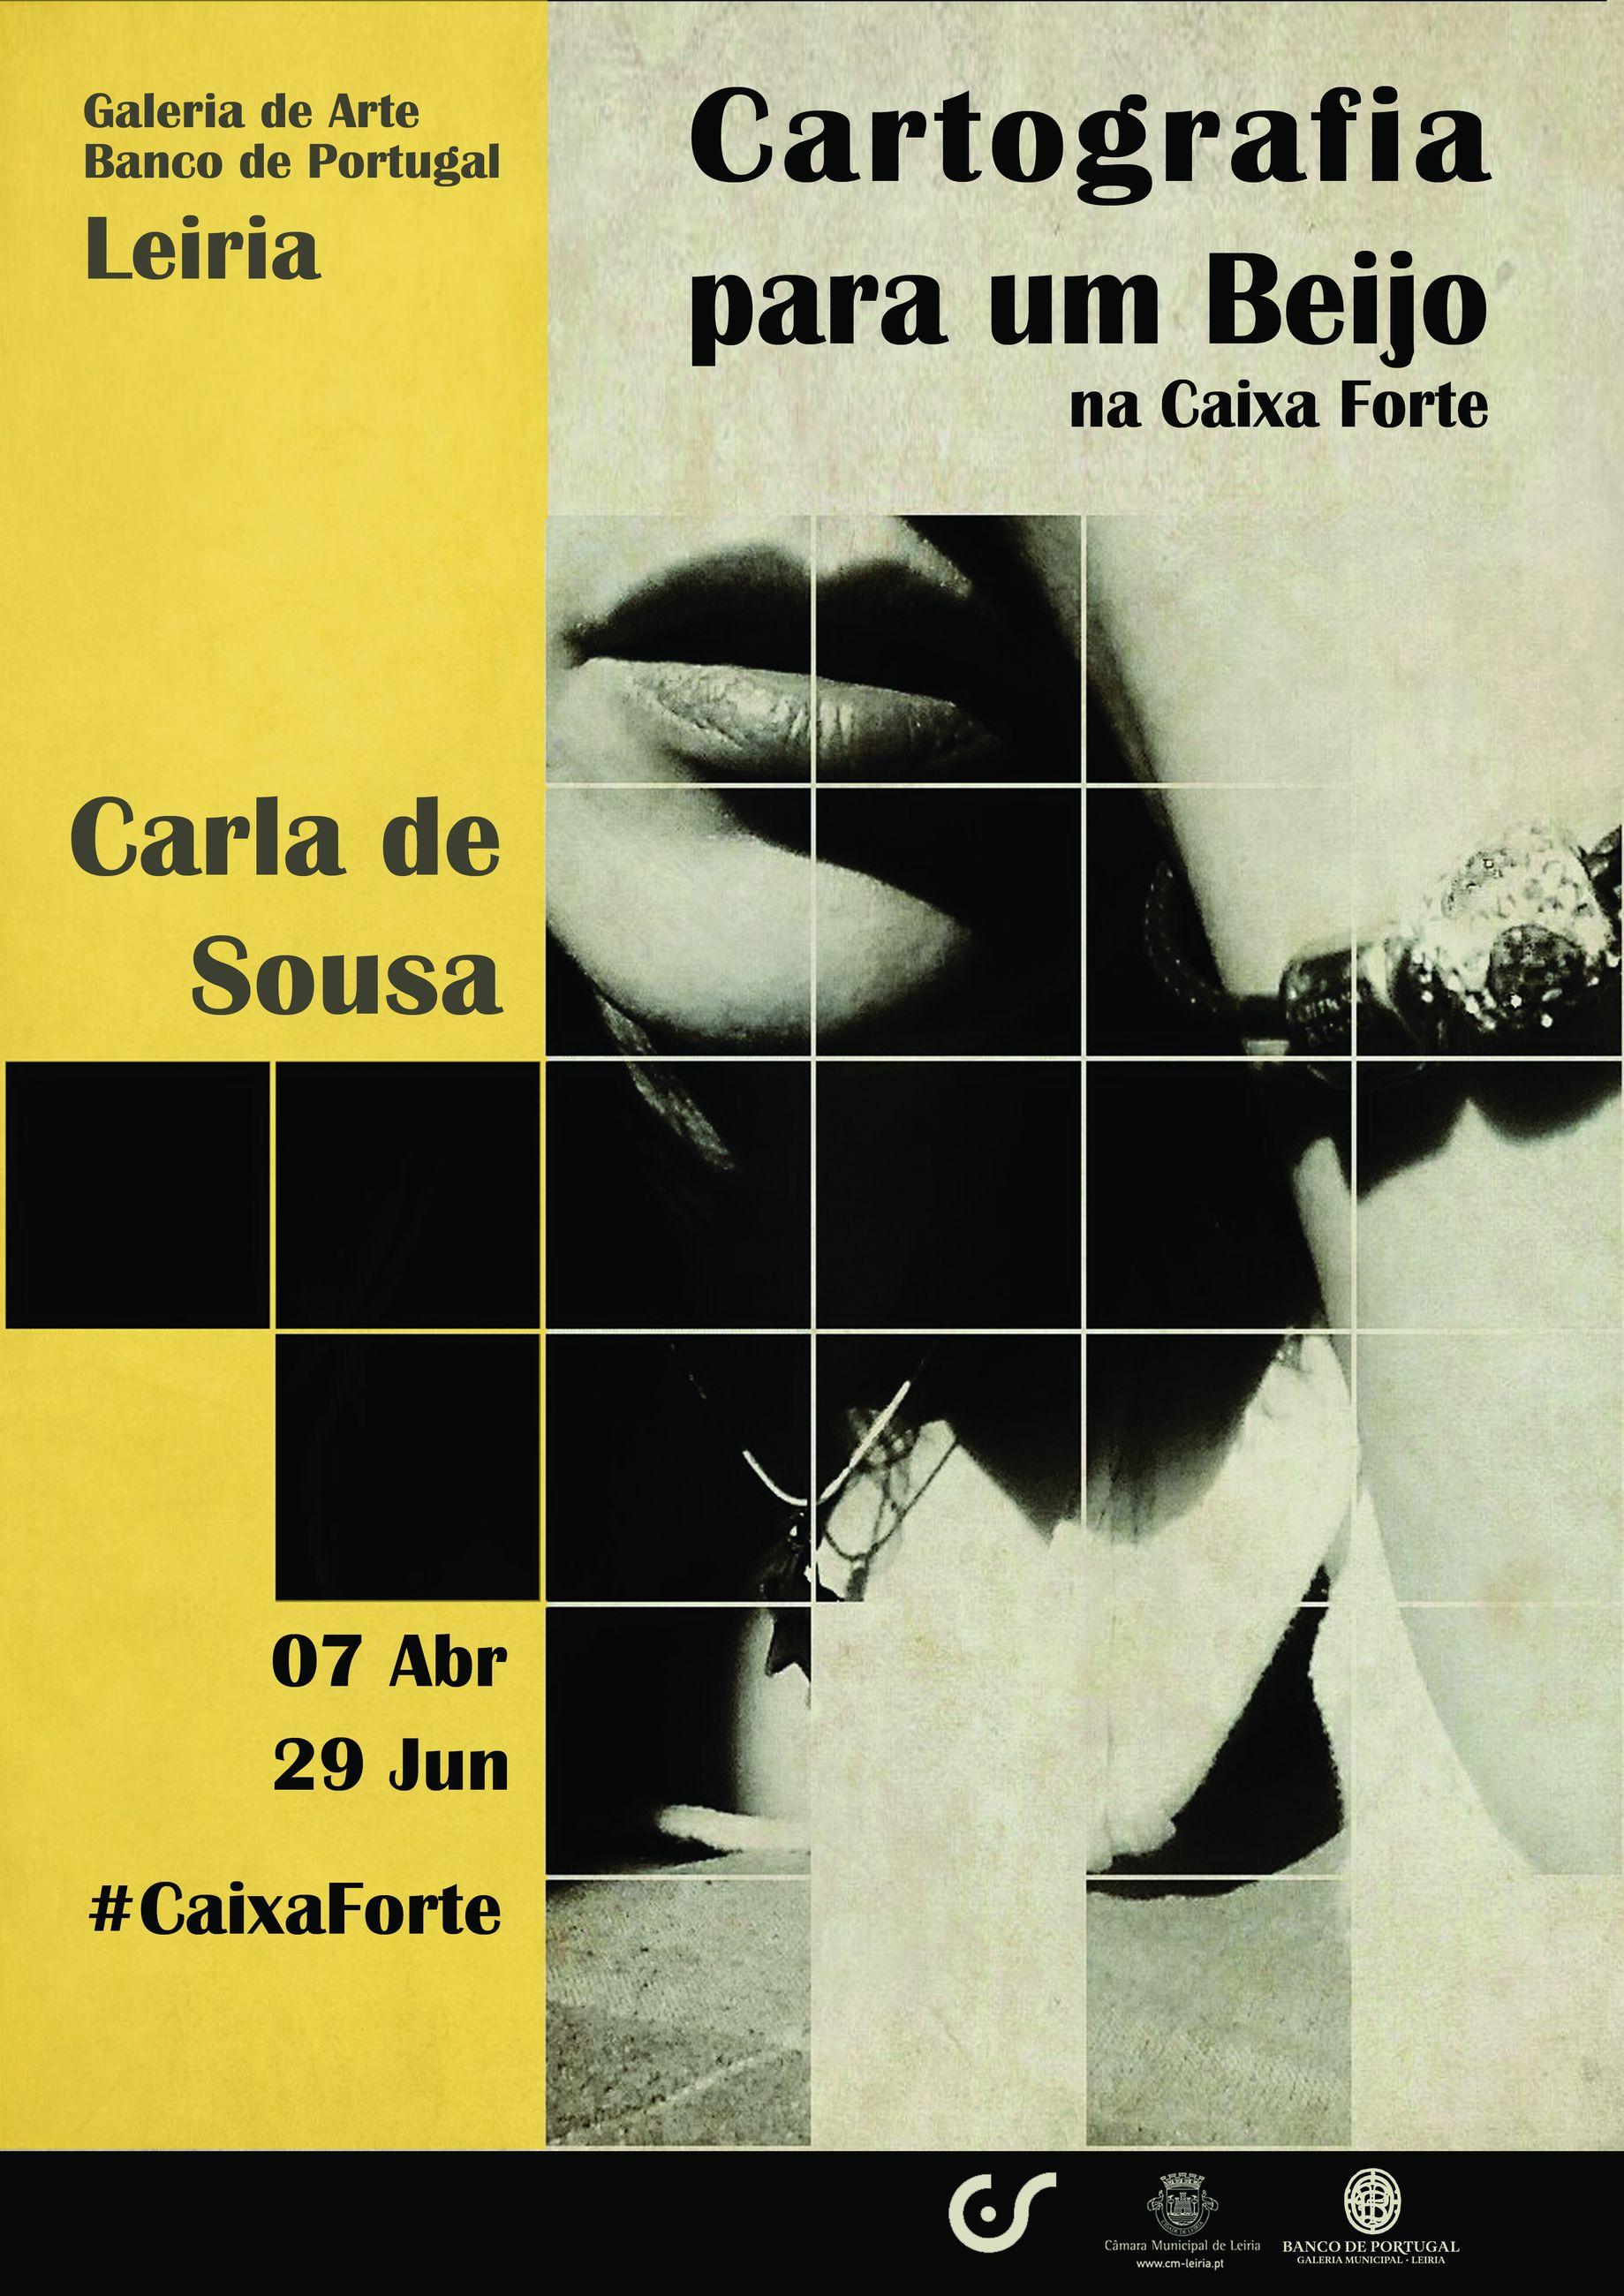 #cartografiaparaumbeijonacaixaforte 😍 ☺ #exhibition